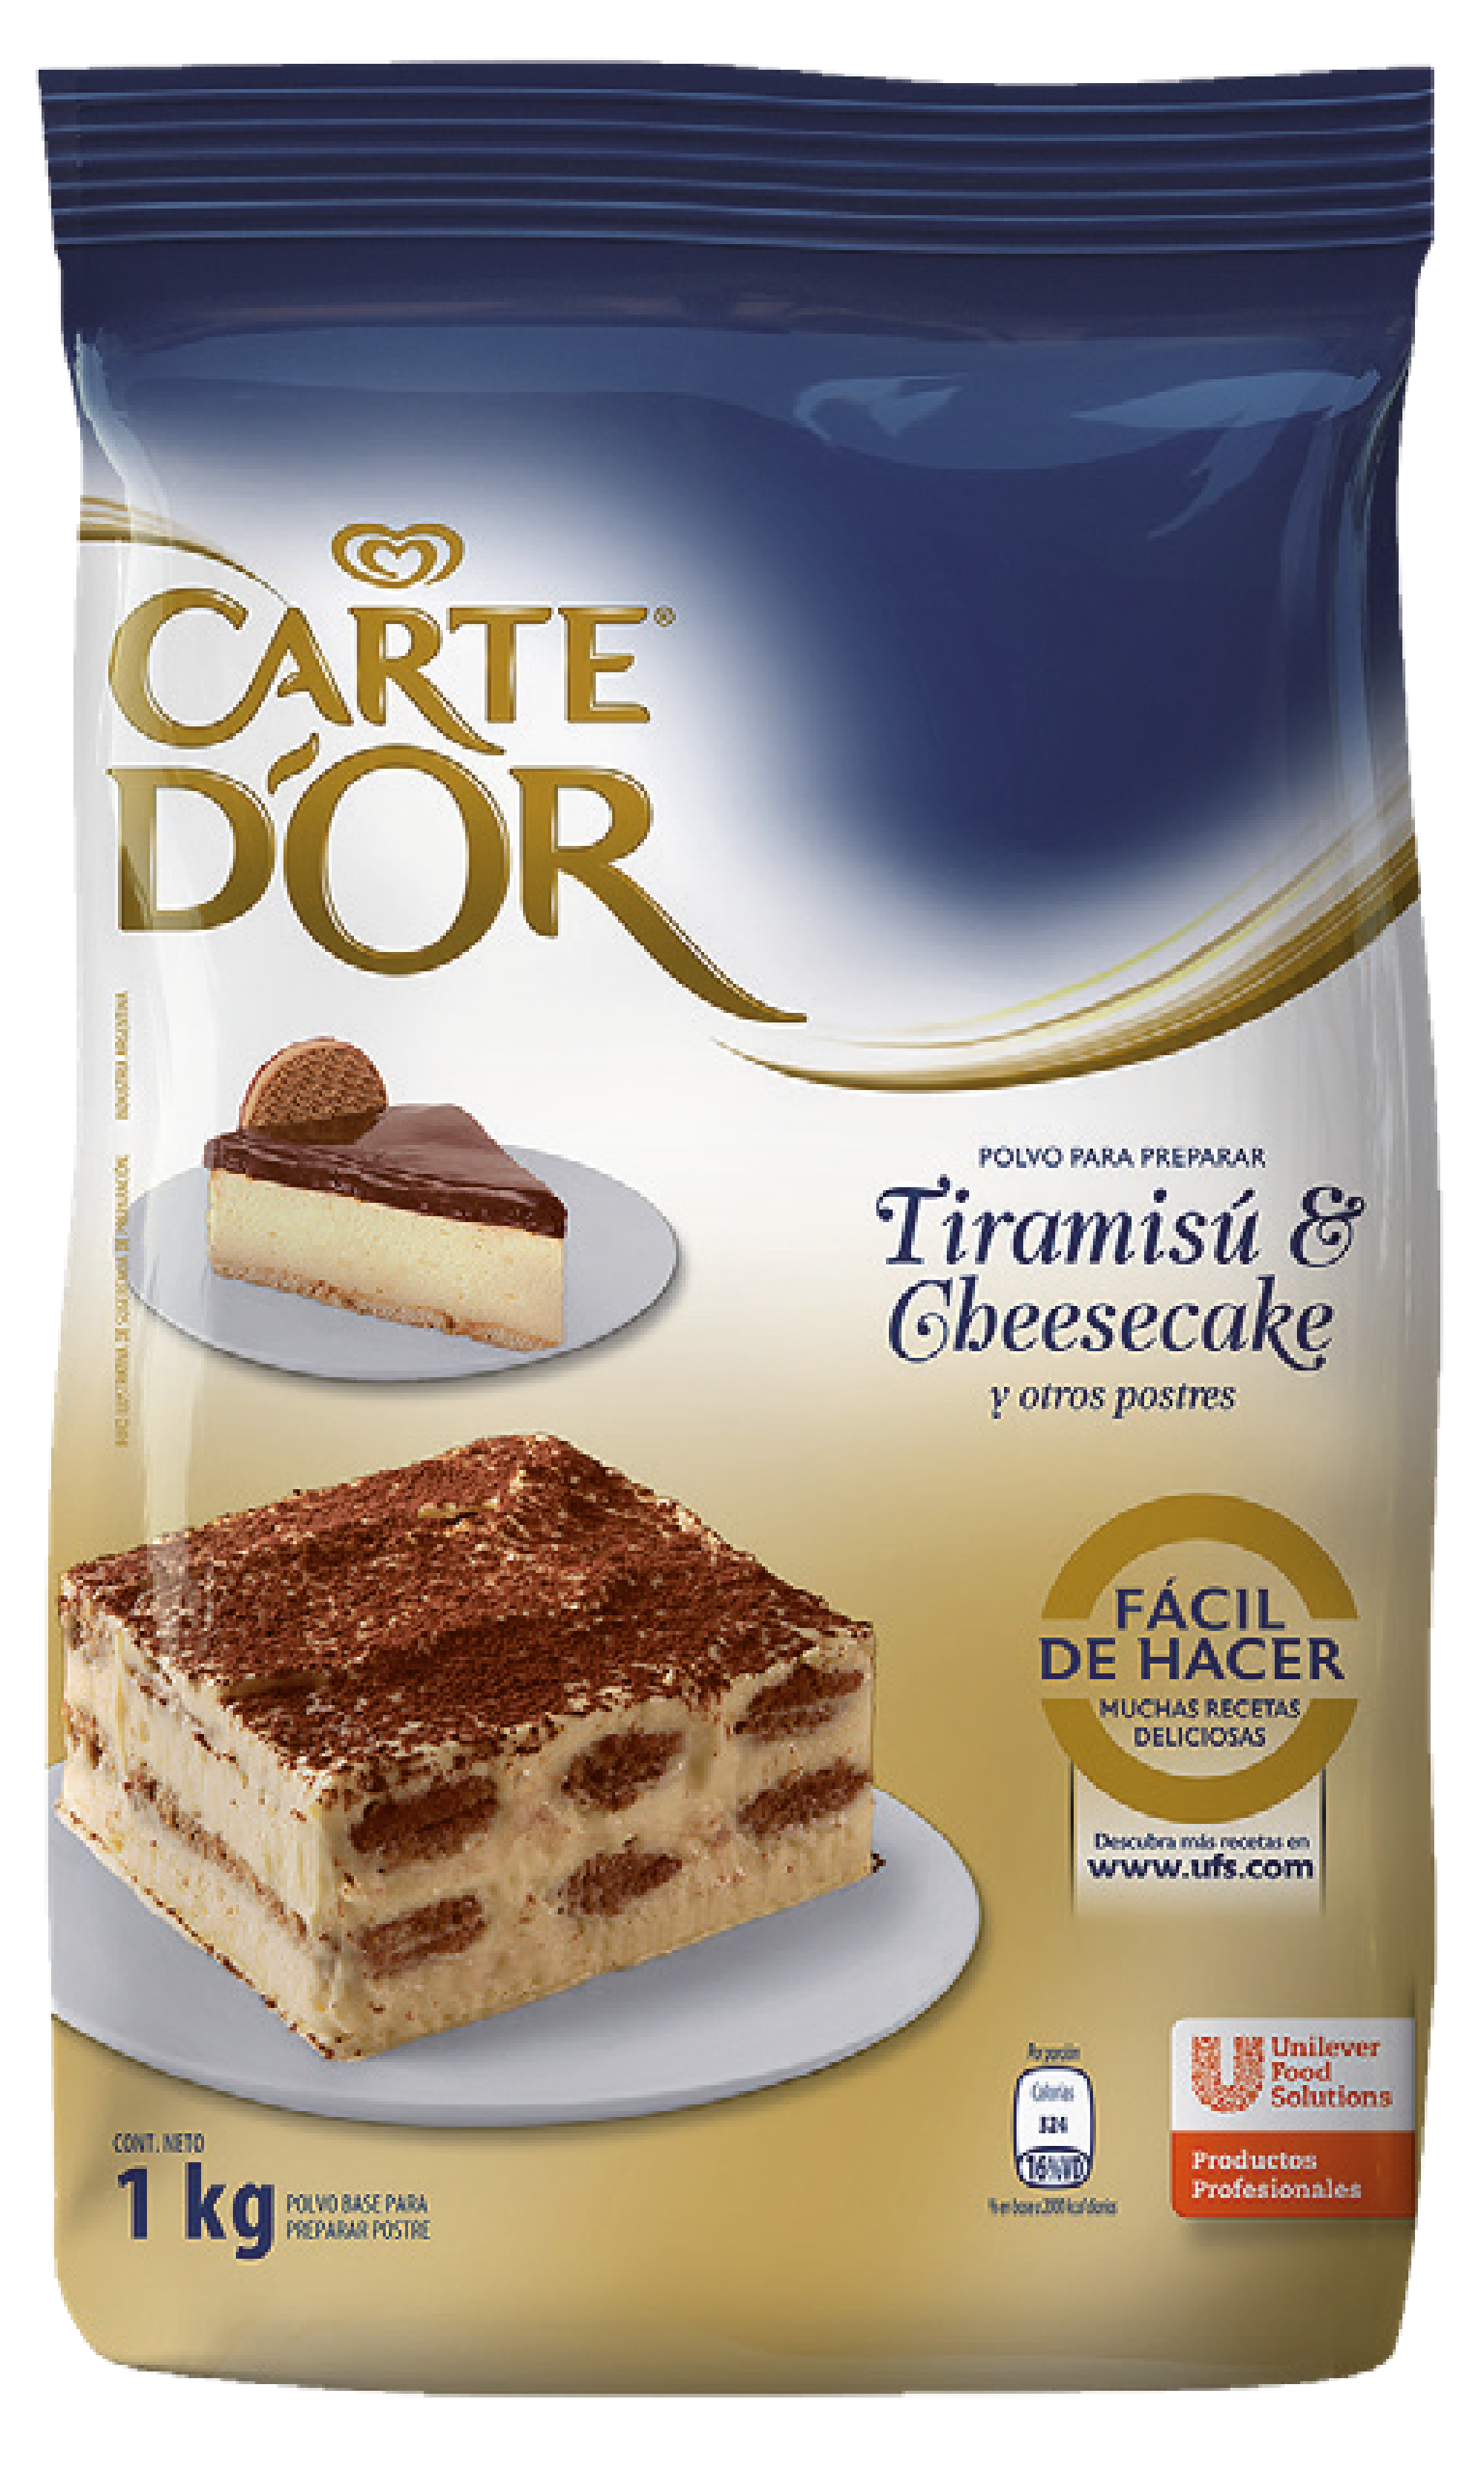 Tiramisú y Cheesecake Carte D'or 1KG - Polvo mezcla semi-preparada para postre Tiramisú y Cheesecake.